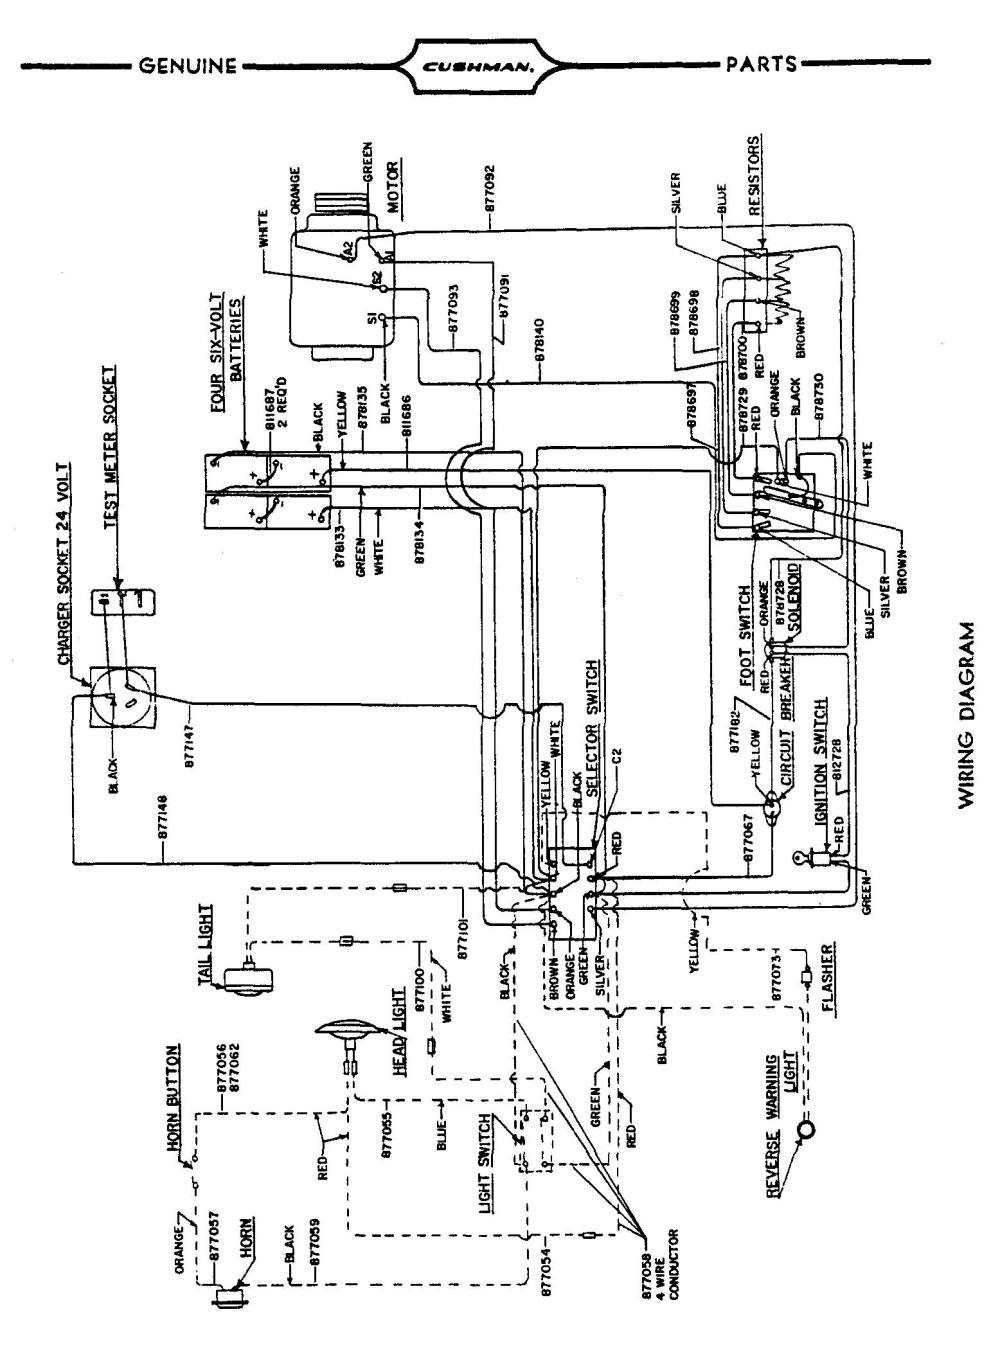 medium resolution of cushman titan wiring diagram wiring diagram centre cushman 48 volt wiring diagram wiring diagram centrecushman 48